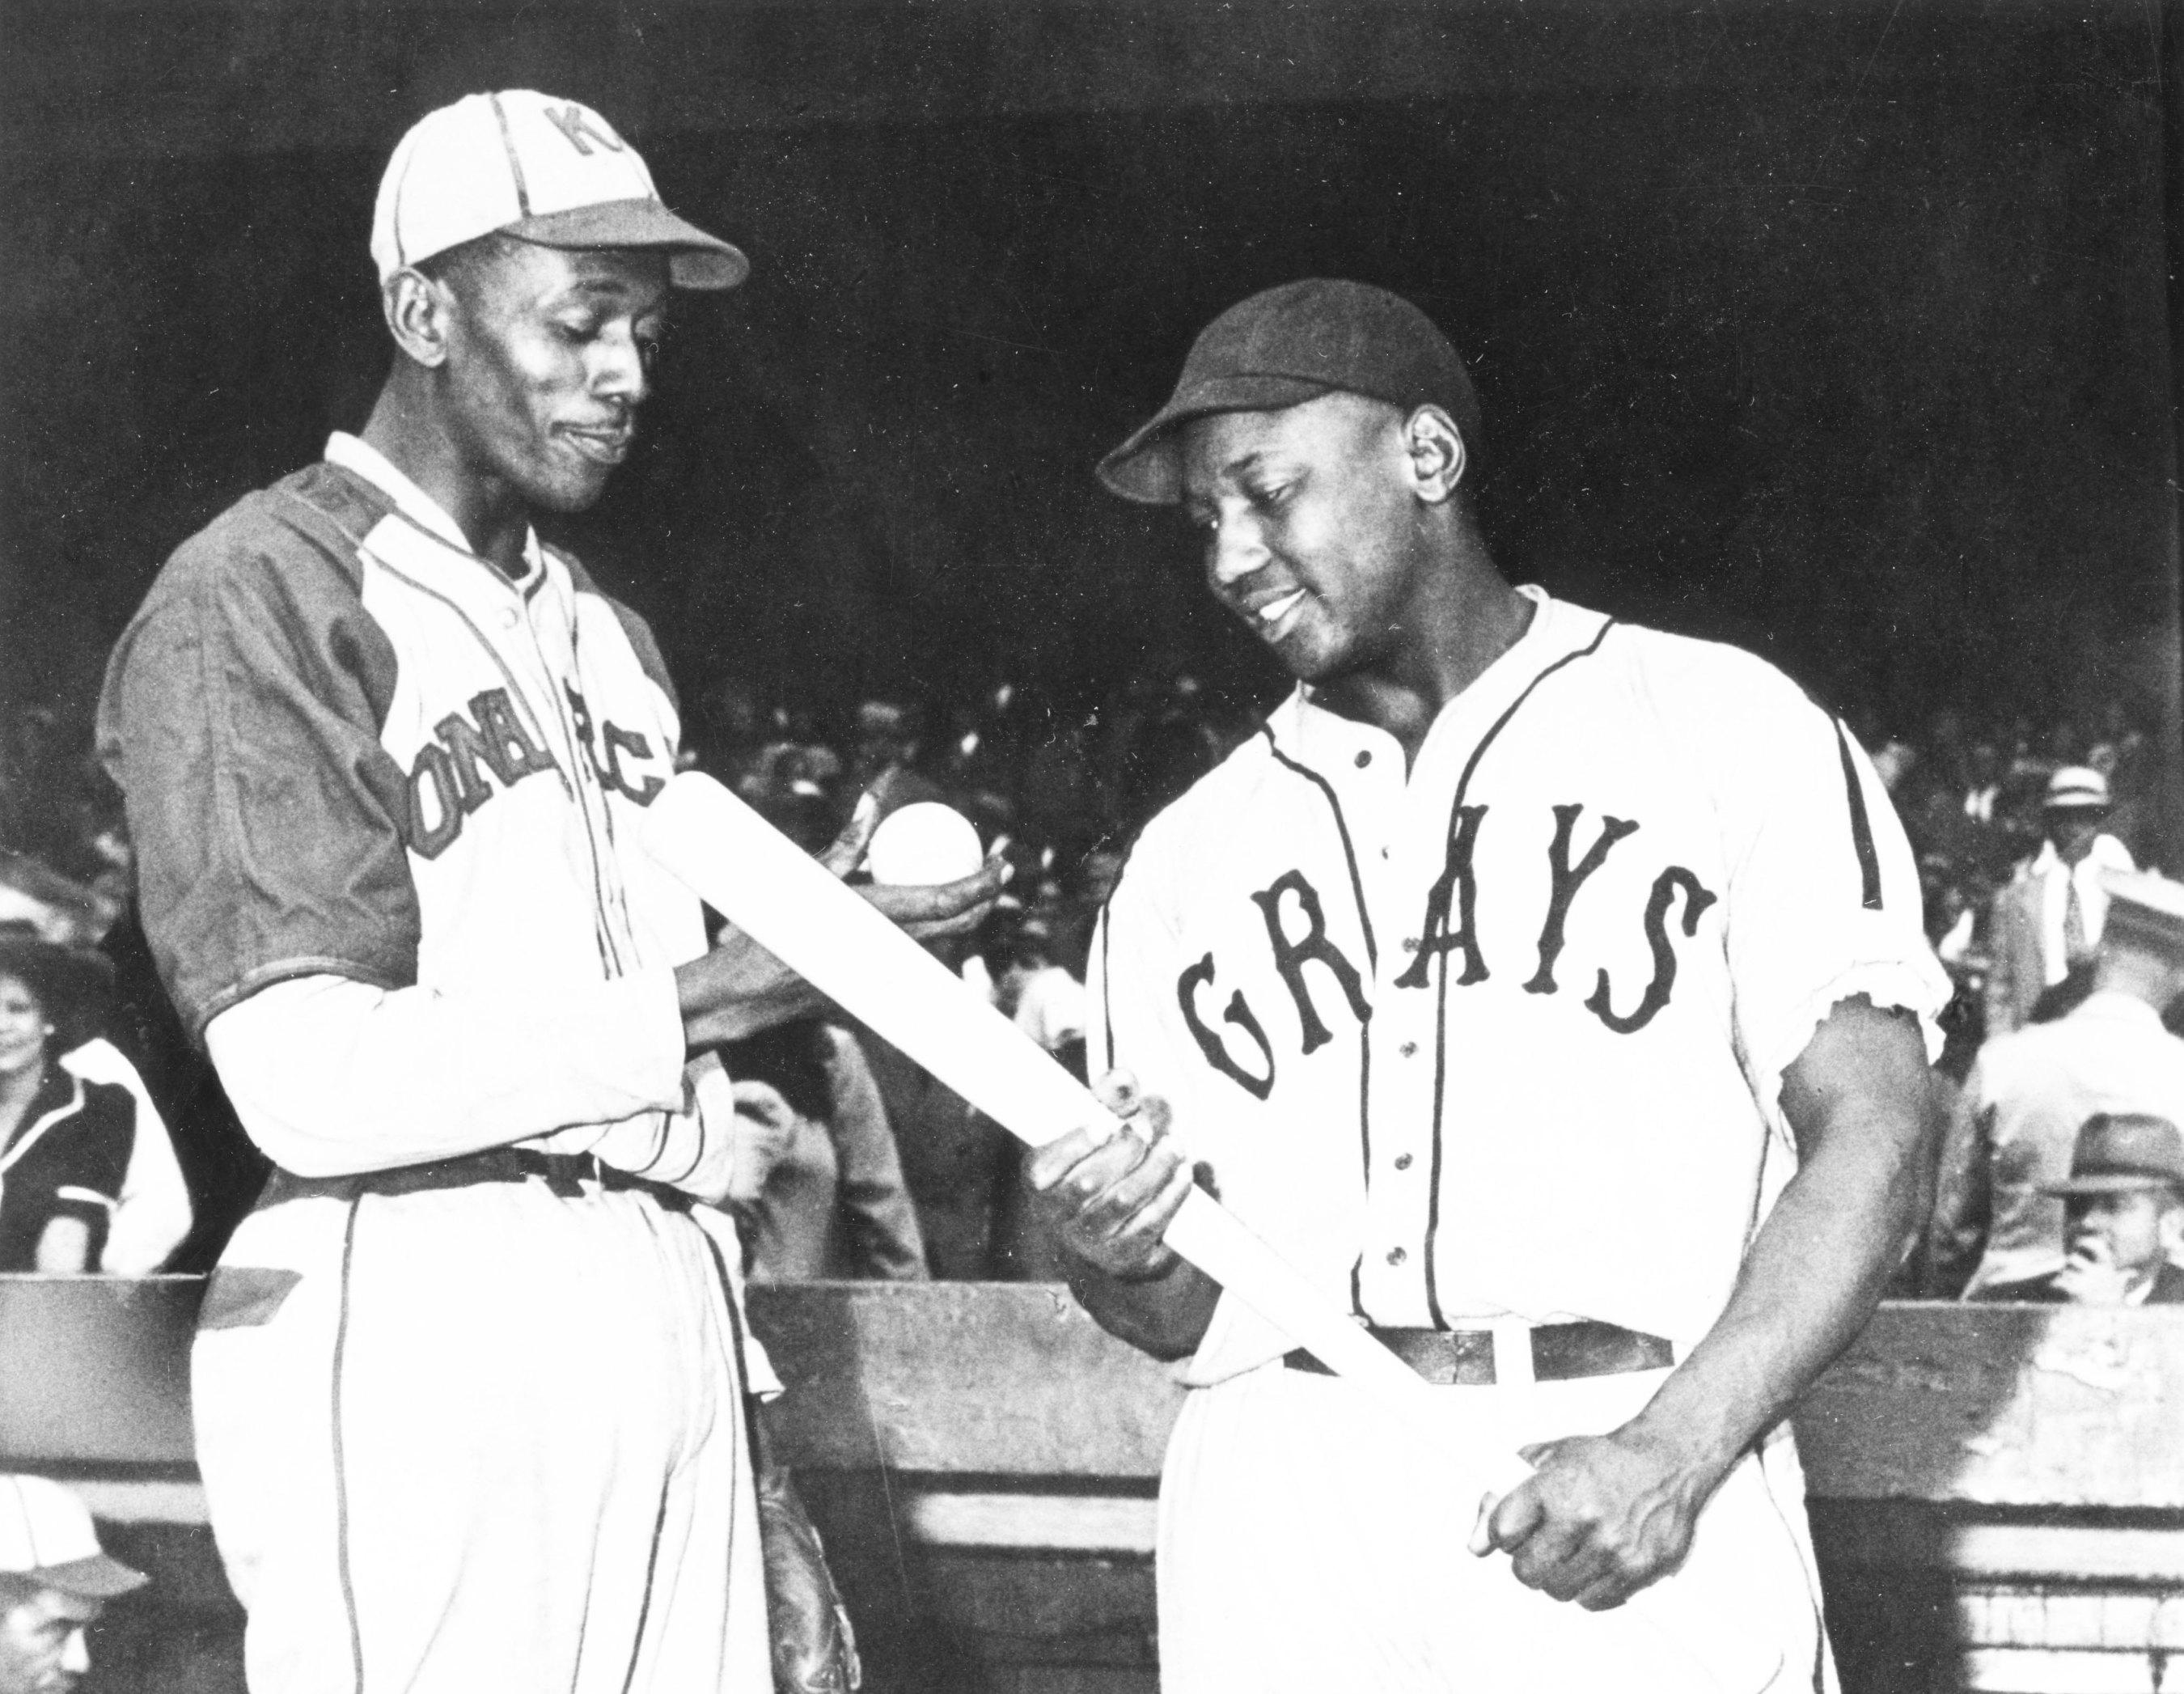 861e4d6444e The history of black baseball in D.C. includes Frederick Douglass  sons